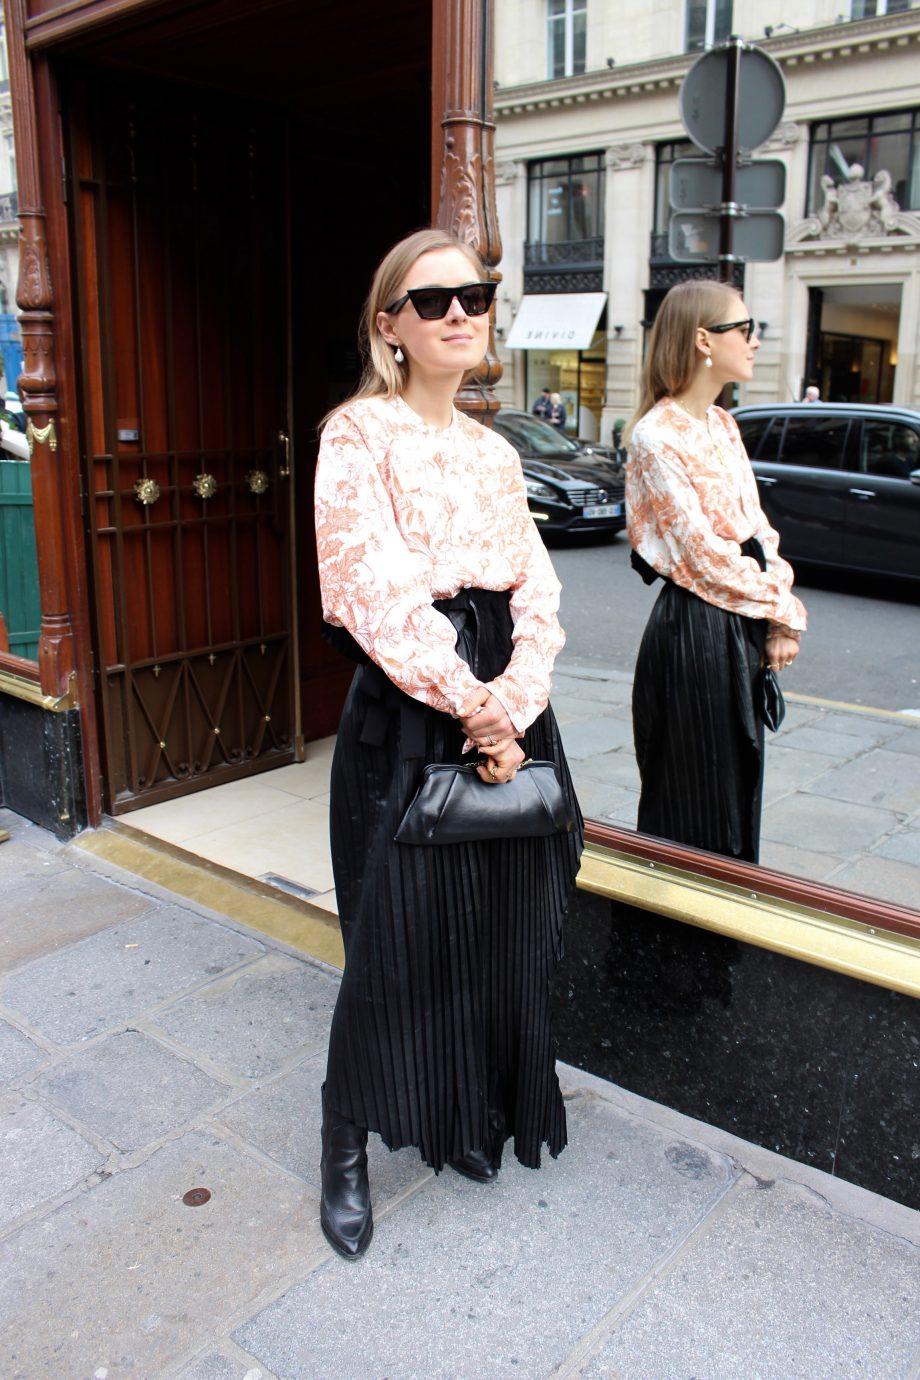 Nobi Talai Leather Skirt  18.03.2018